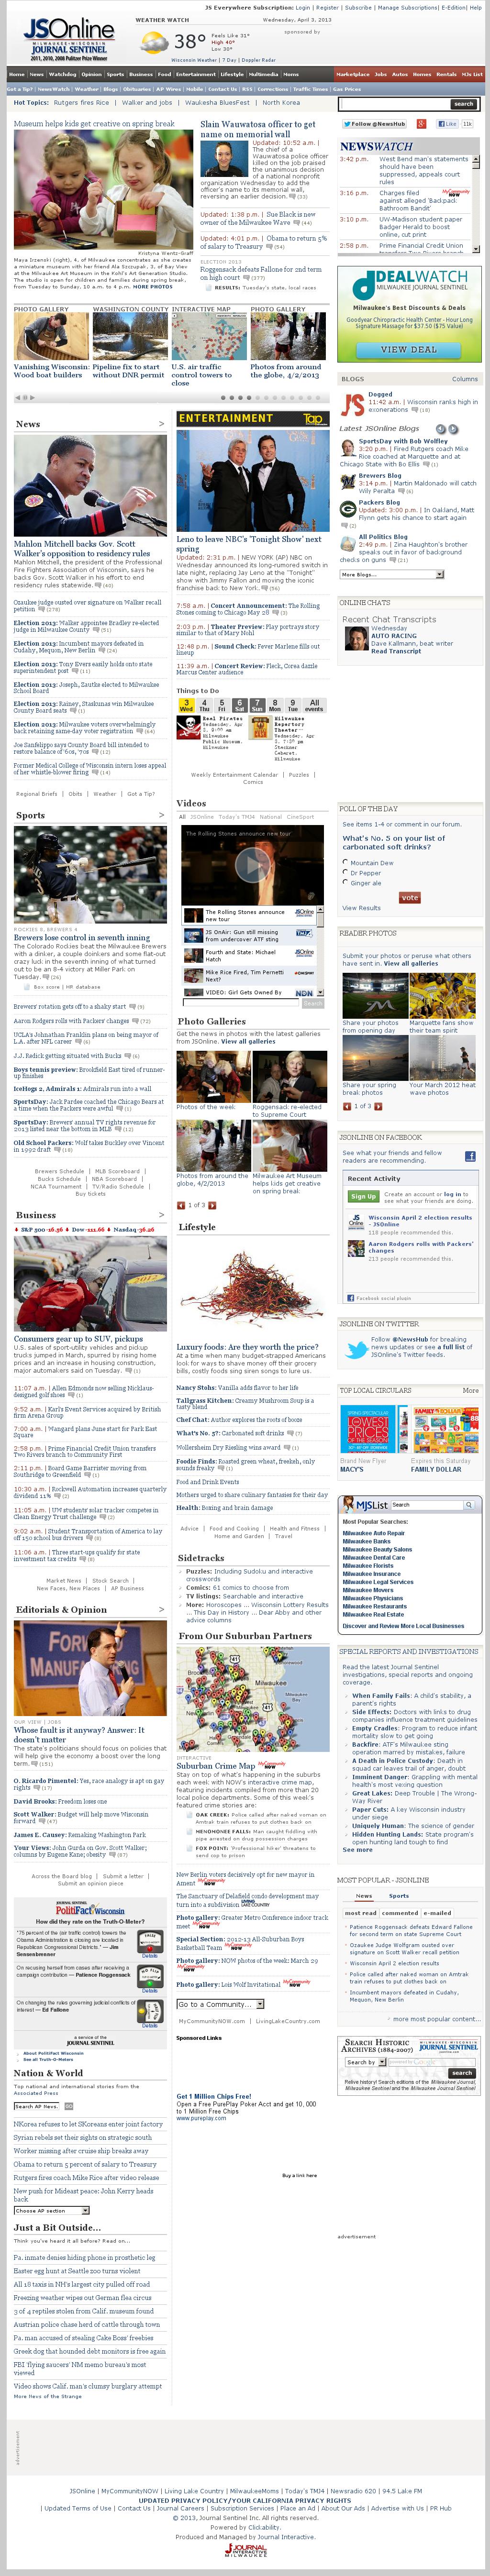 Milwaukee Journal Sentinel at Wednesday April 3, 2013, 9:12 p.m. UTC